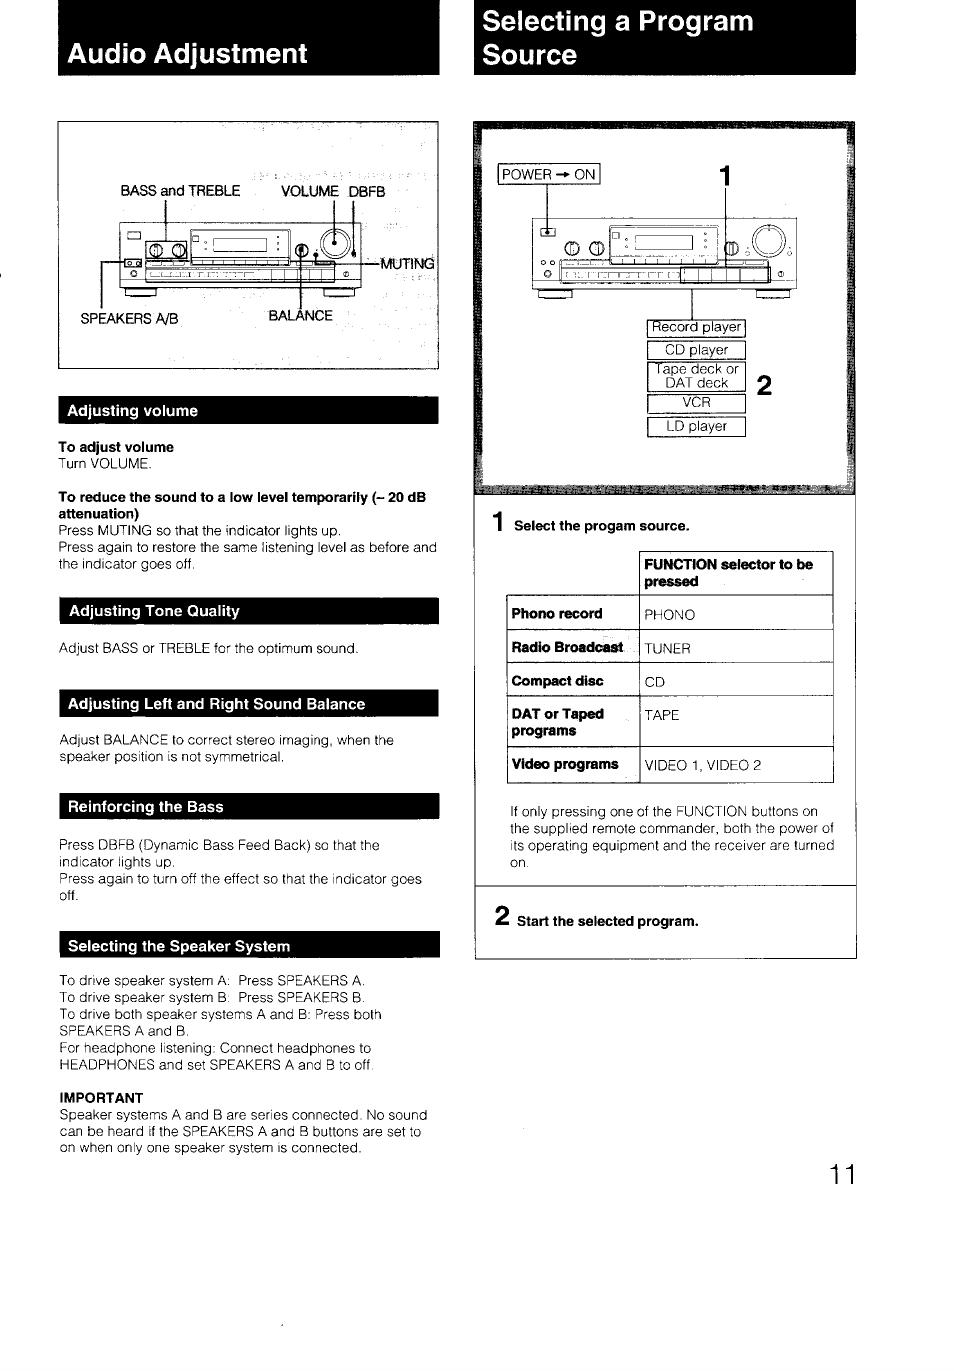 Audio adjustment, Selecting a program source, Adjusting